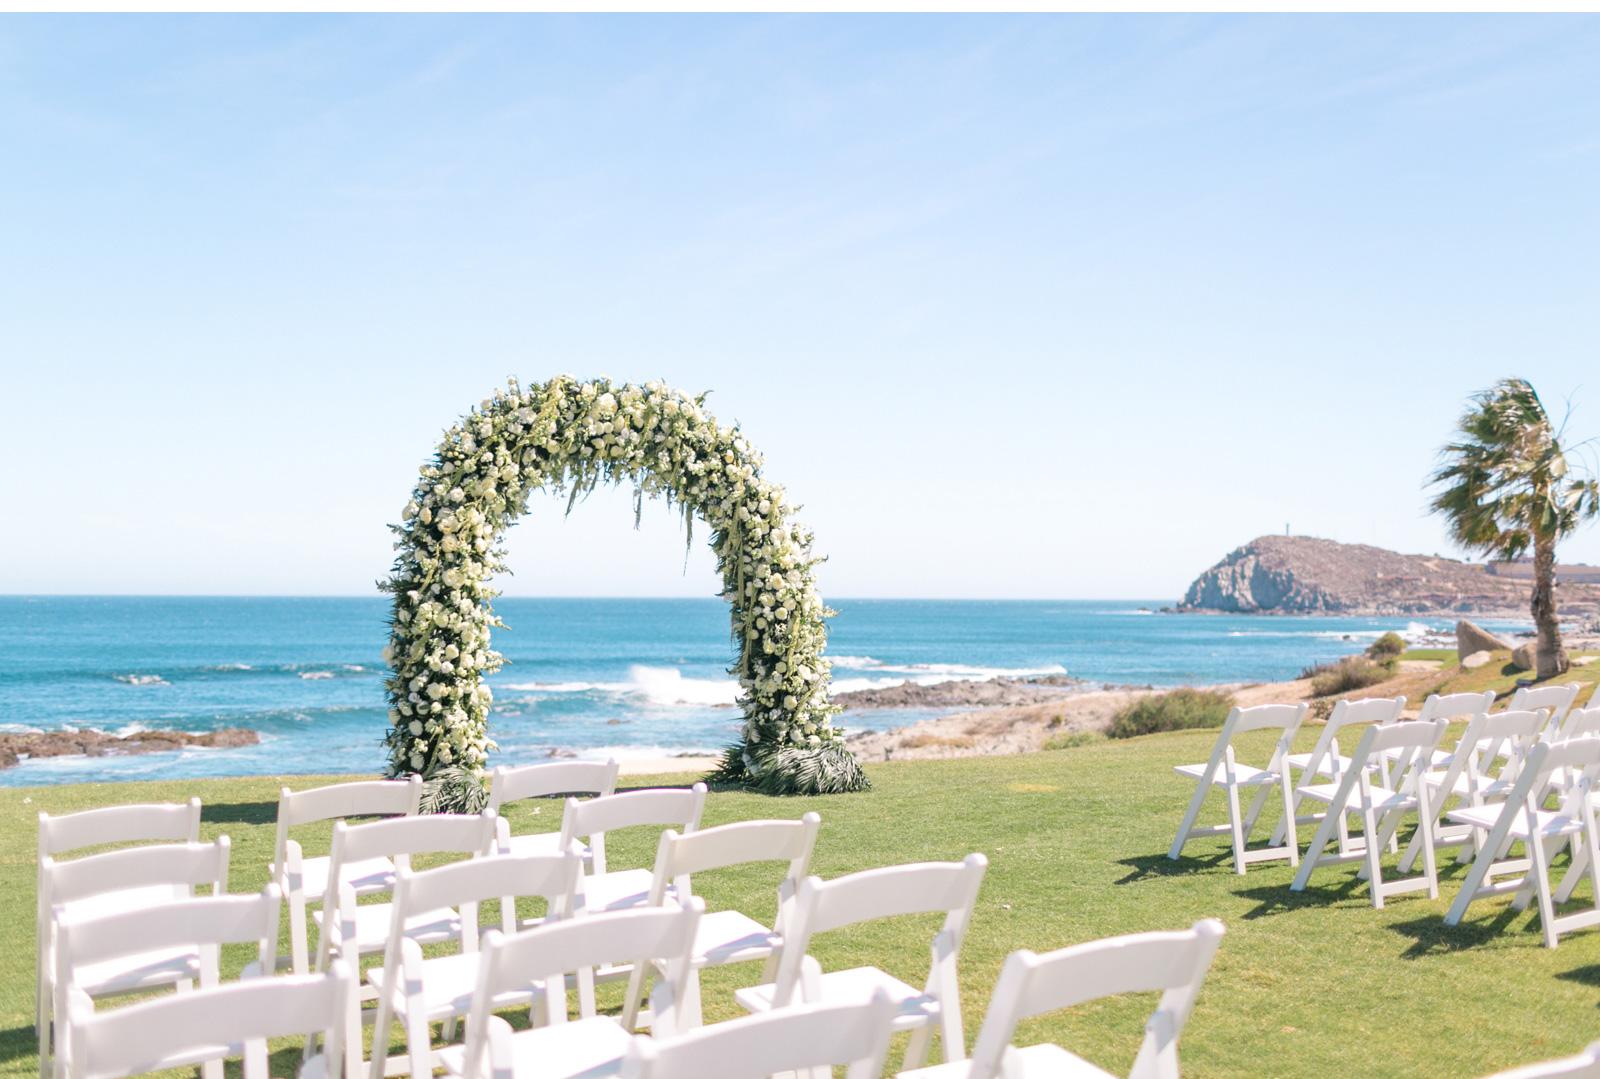 Cabo-Destination-Wedding-Natalie-Schutt-Photography_02.jpg